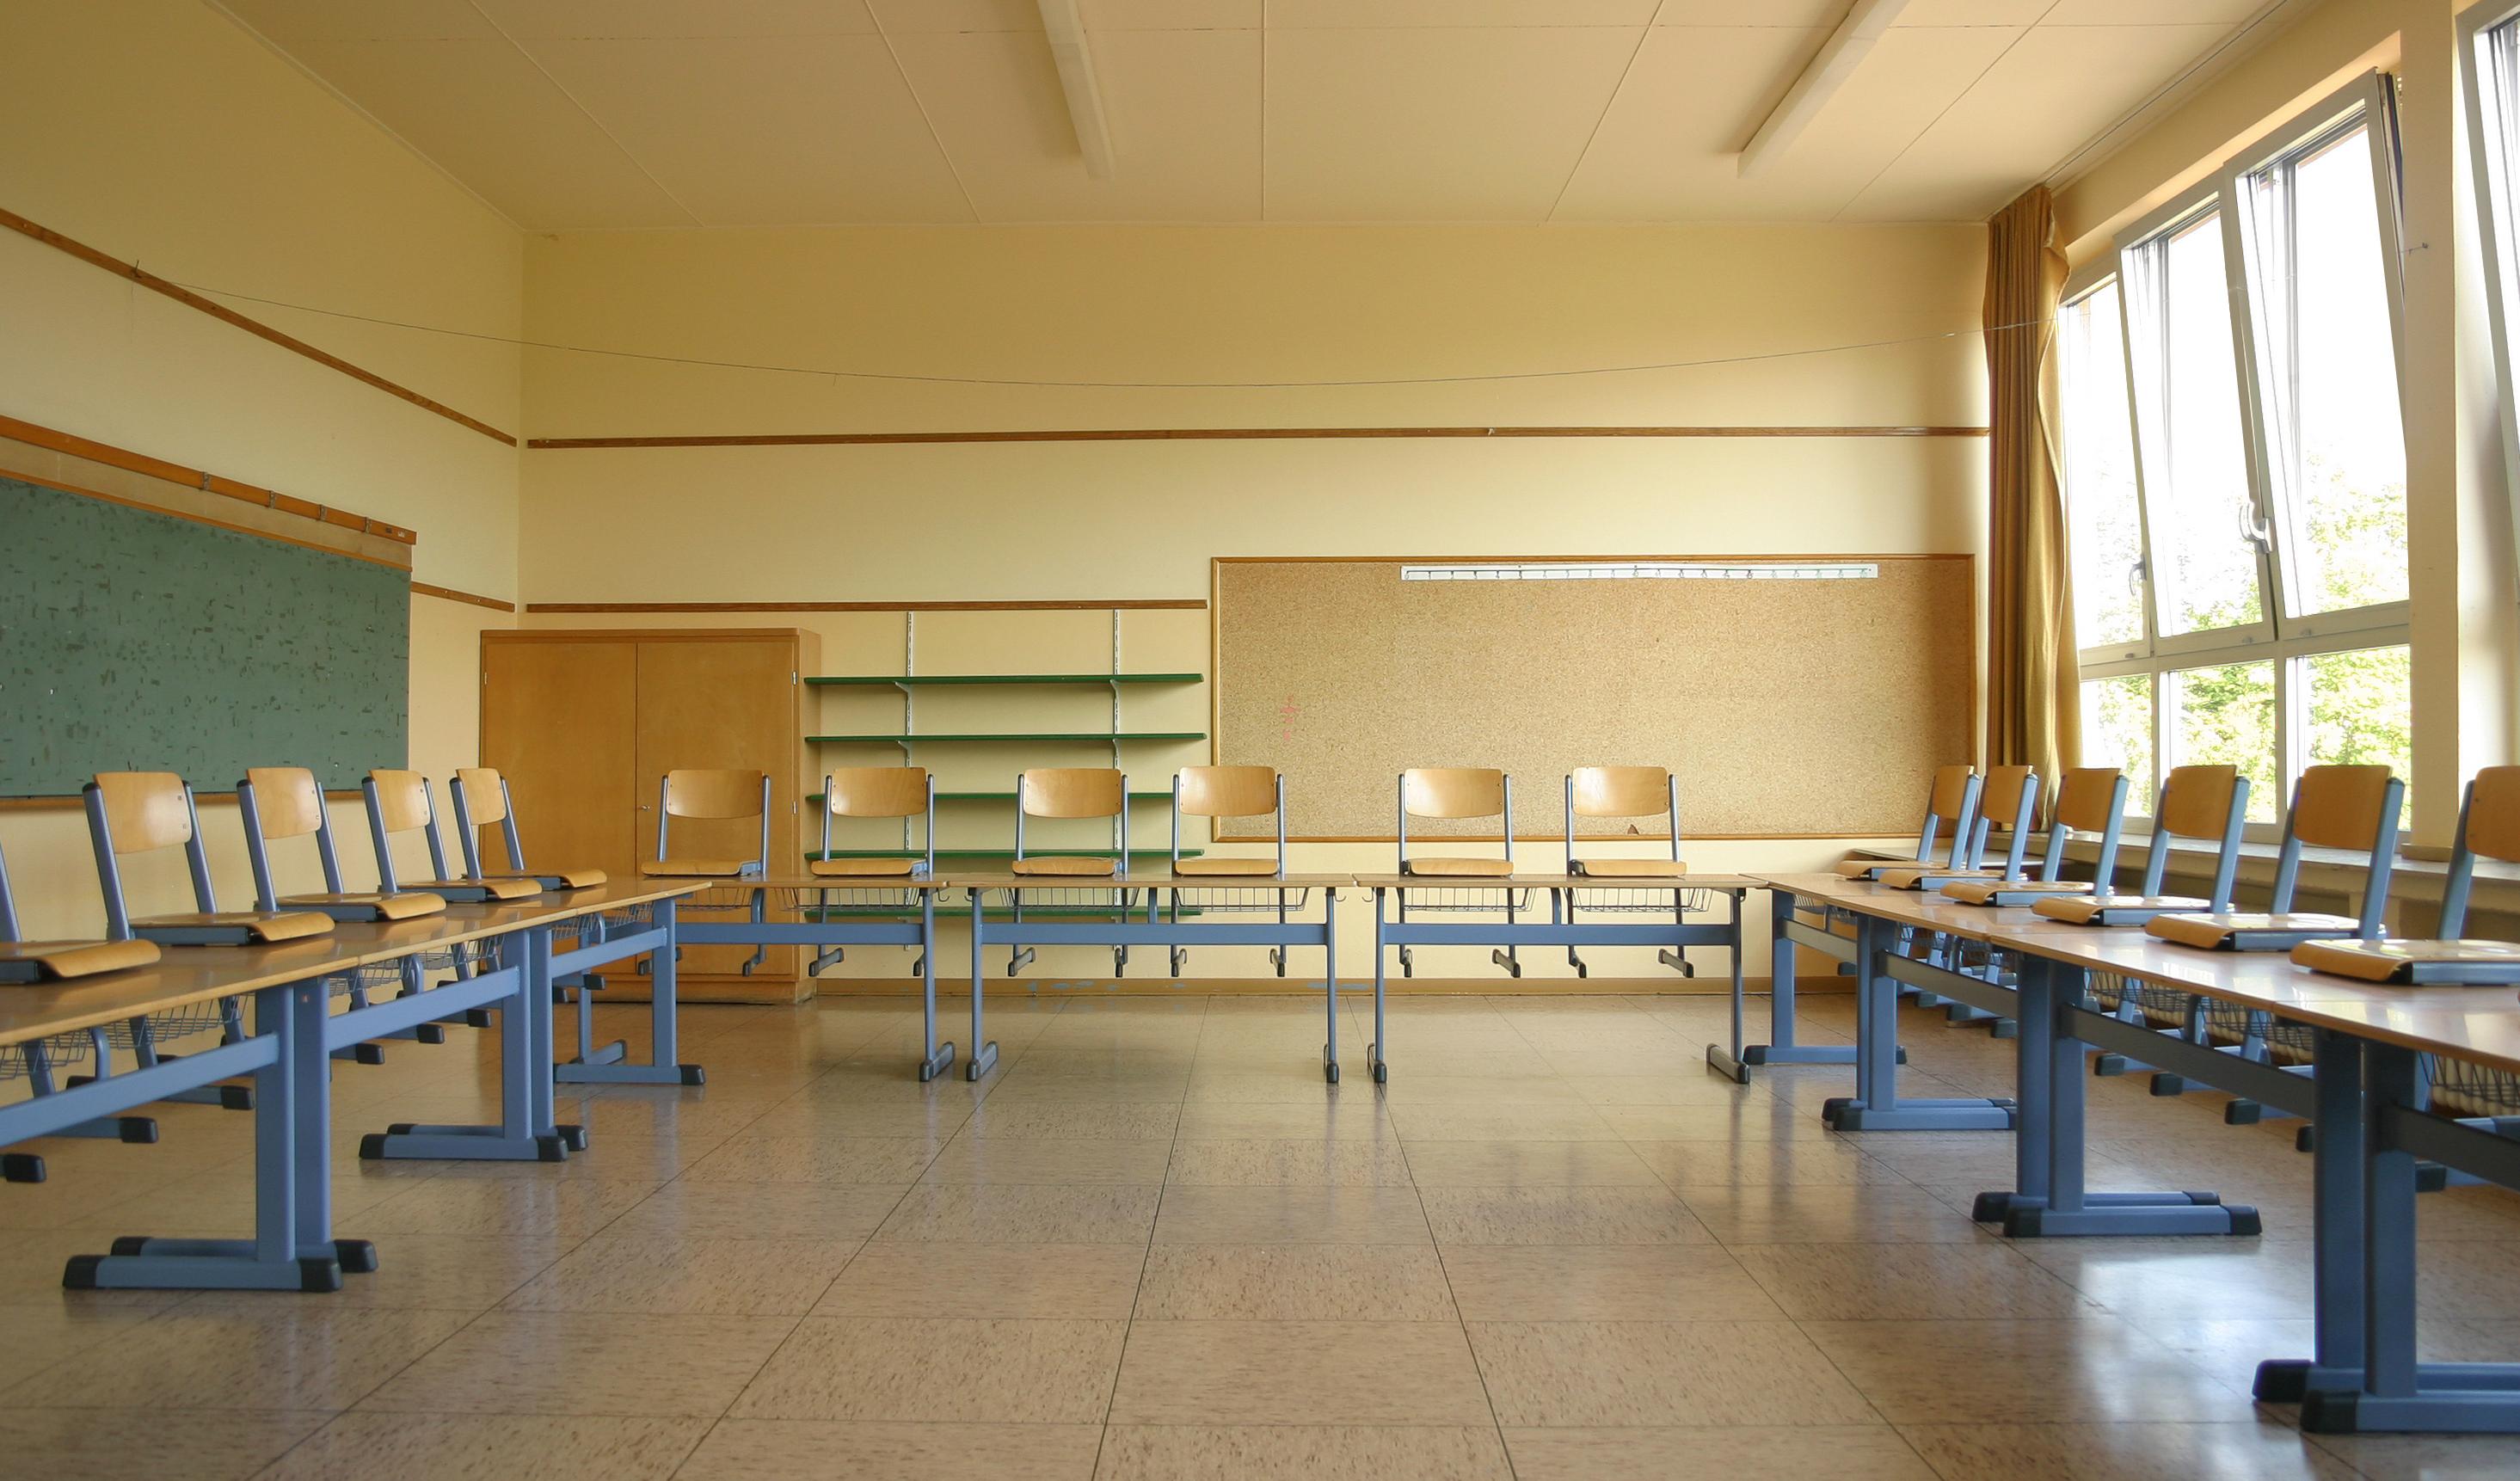 Classroom Wallpaper Design ~ School classroom background pixshark images